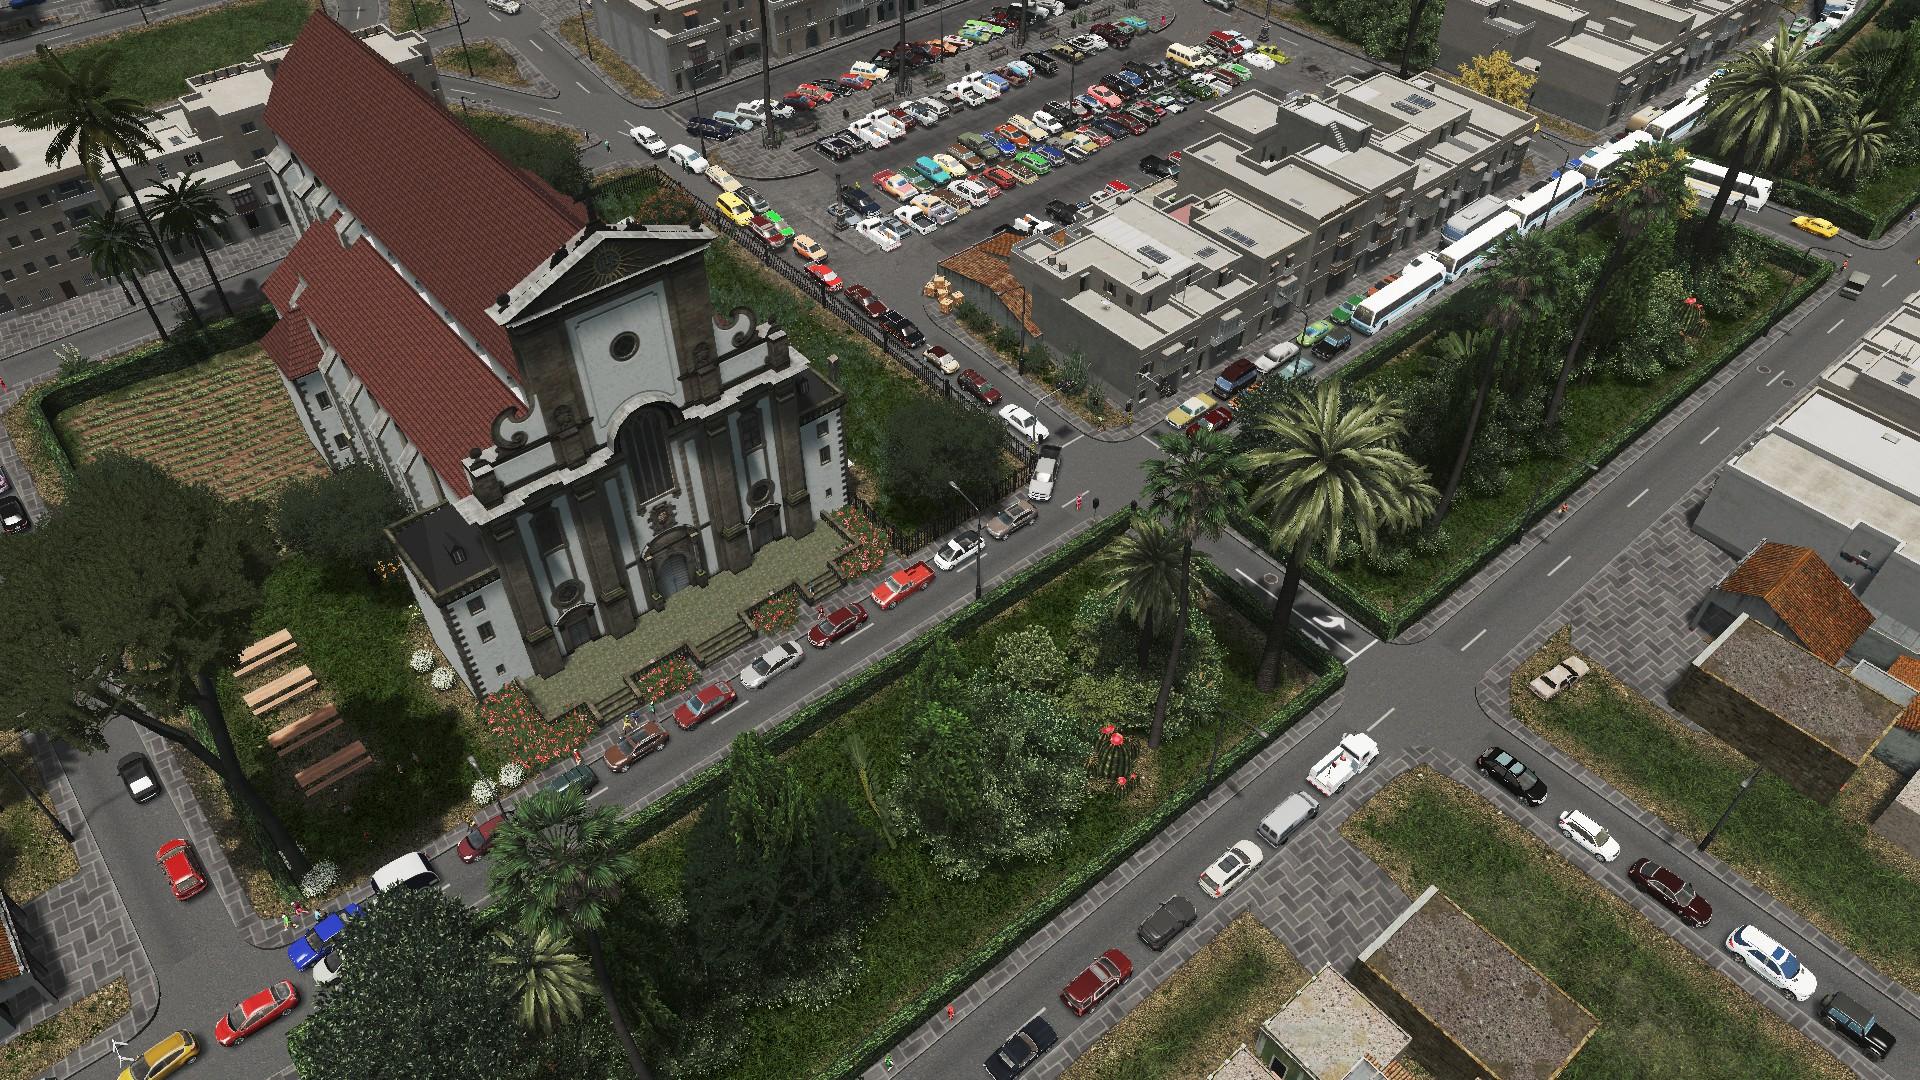 [UPB] Sonoma, ES - P.22 Nova Cidade - Page 20 2F20483E027655741A52527C007B0AF816F1C334